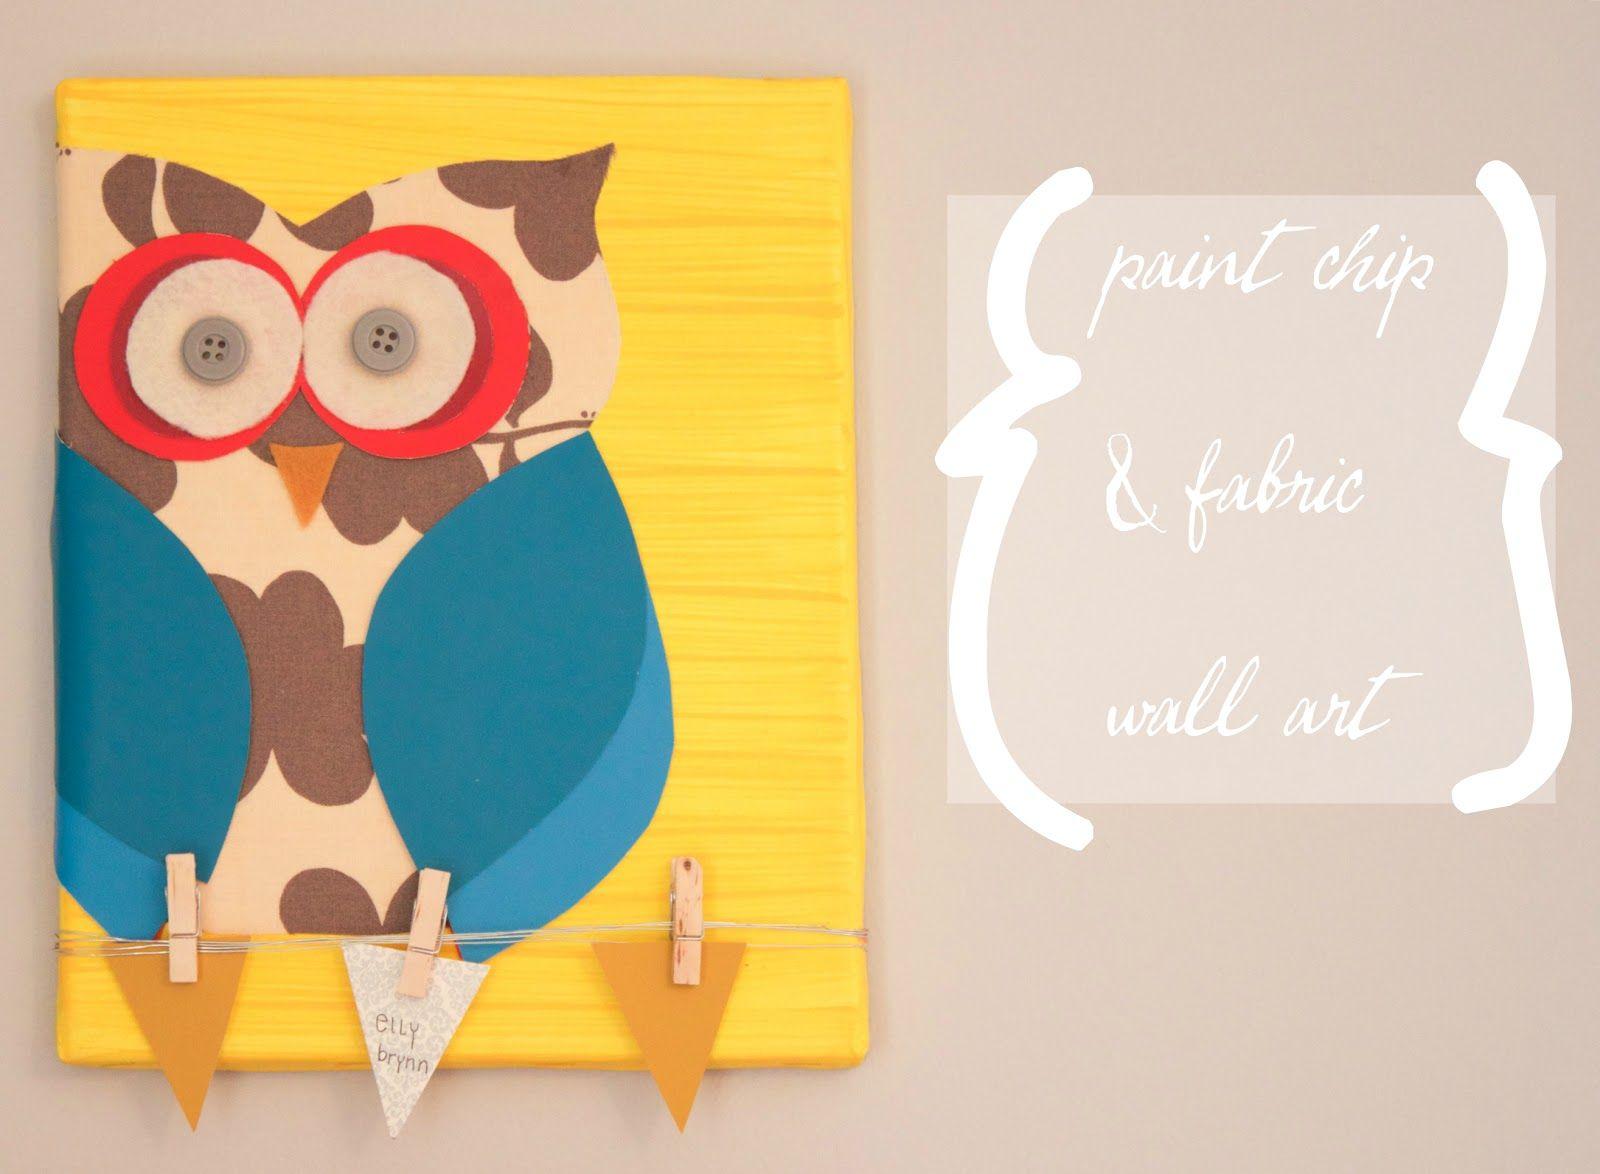 the winthrop chronicles: paint chips + canvas = art | Art ...